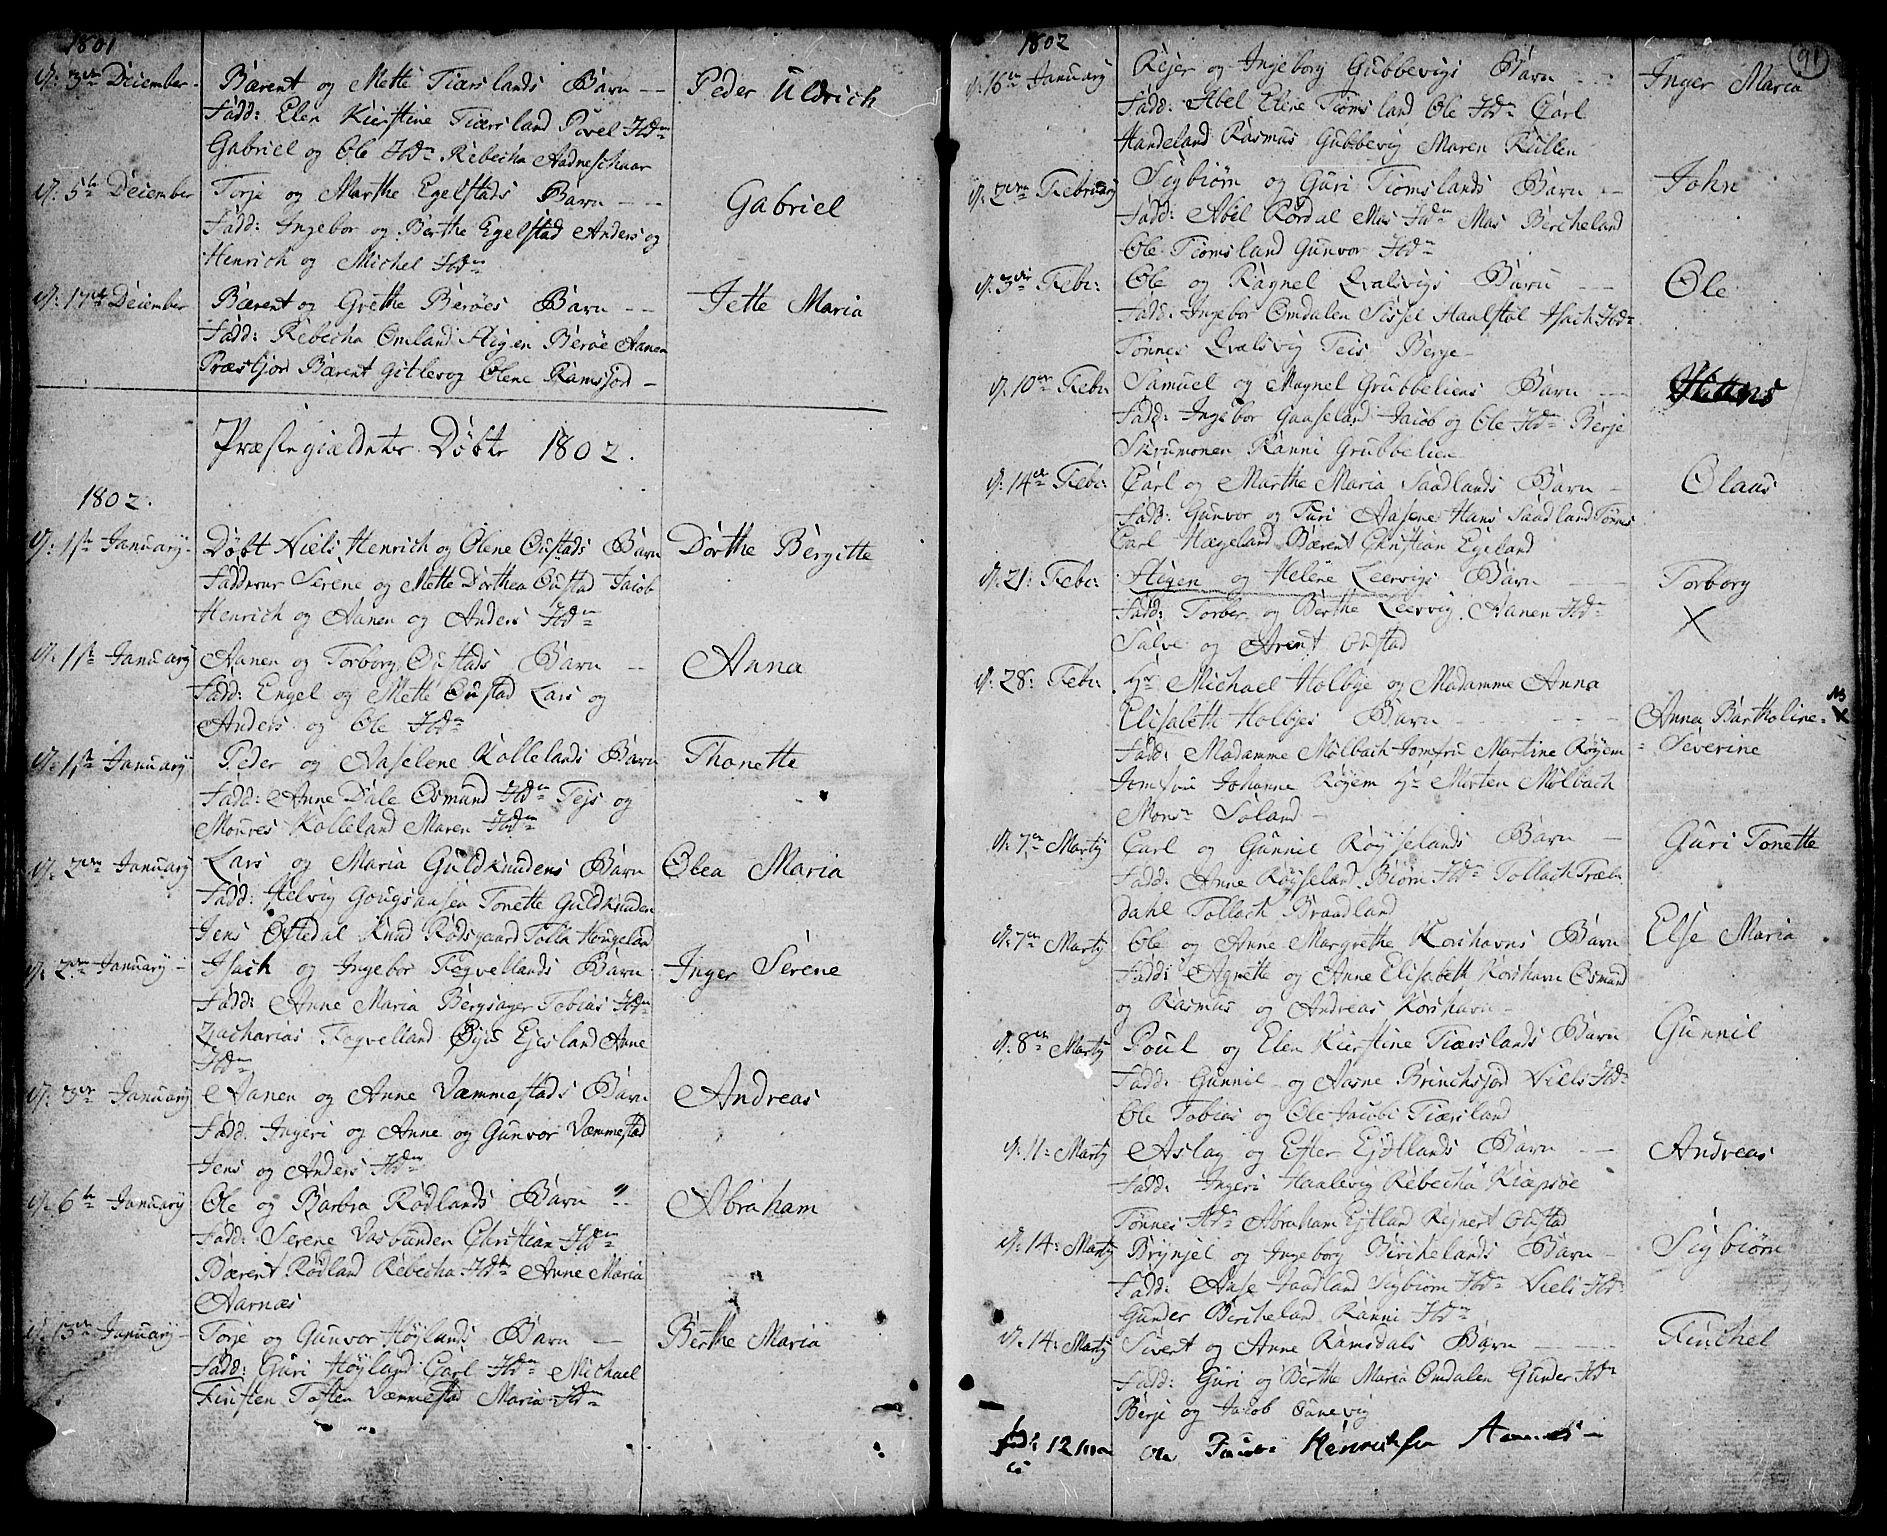 SAK, Lyngdal sokneprestkontor, F/Fa/Fac/L0004: Ministerialbok nr. A 4, 1780-1815, s. 91